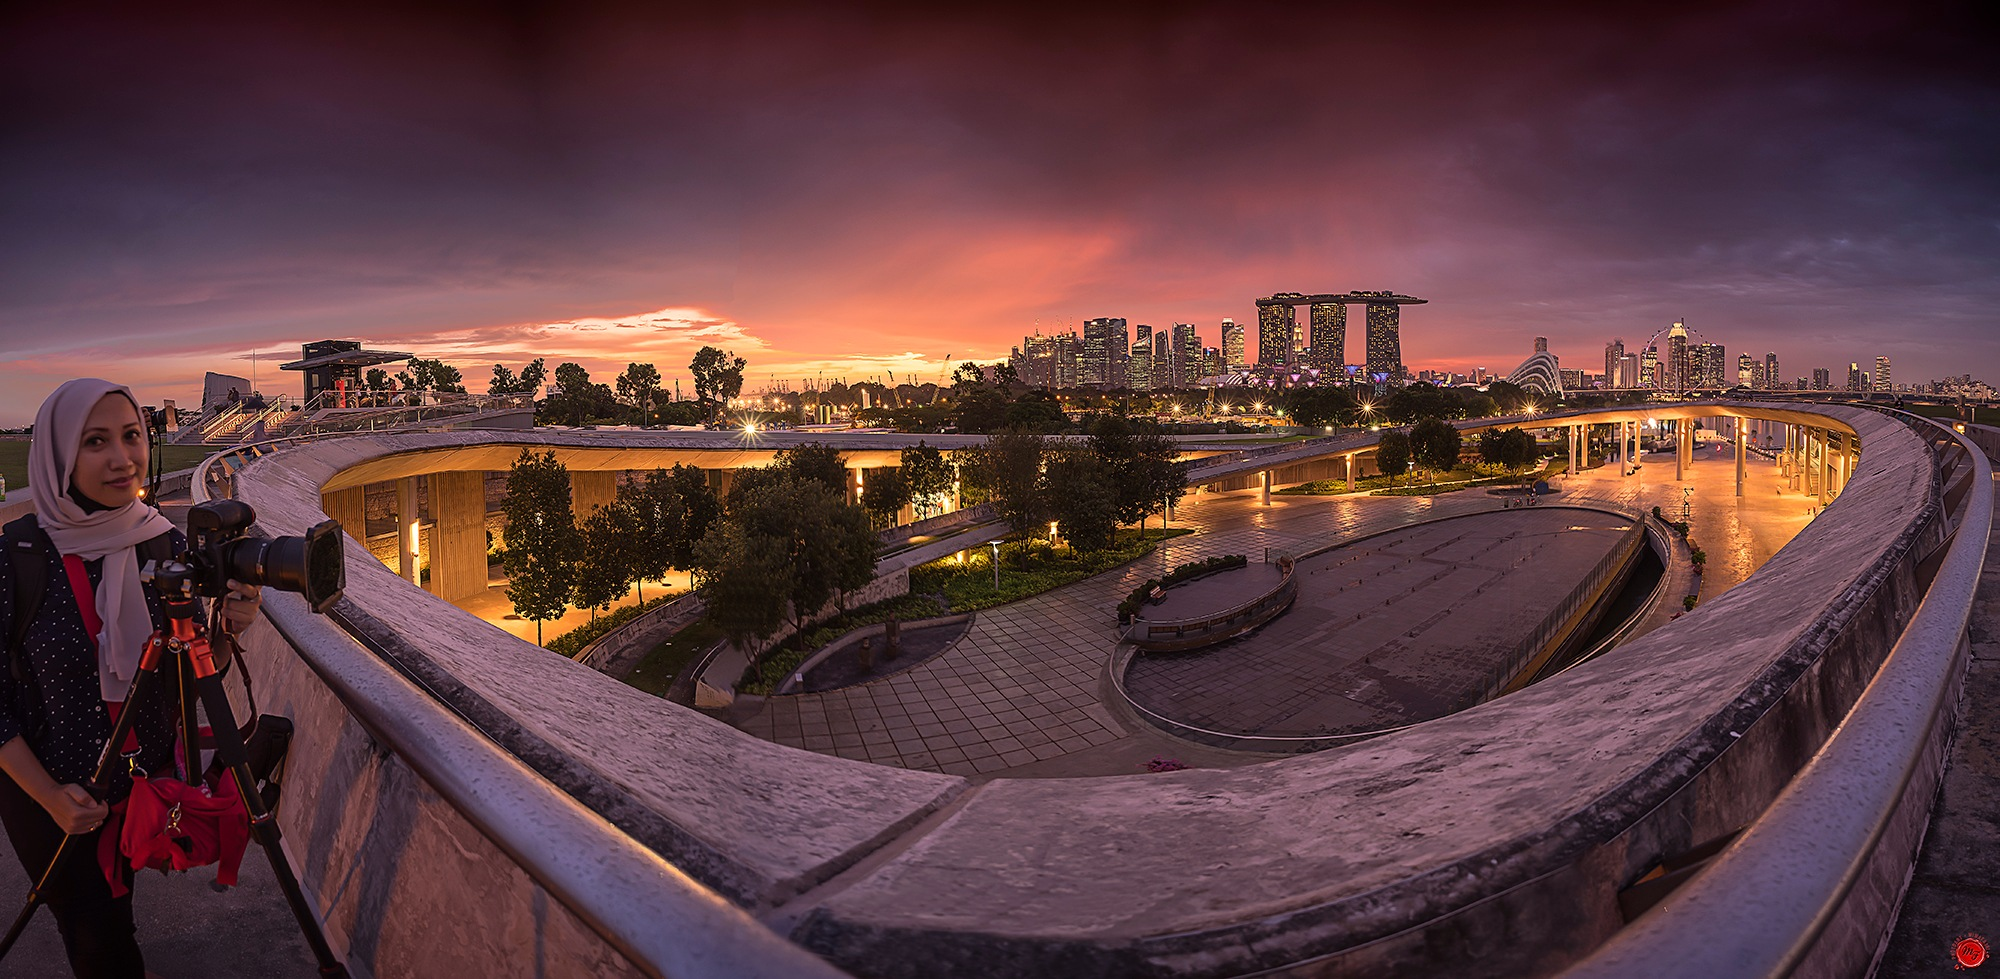 Marina Barrage by Fajri Miwa